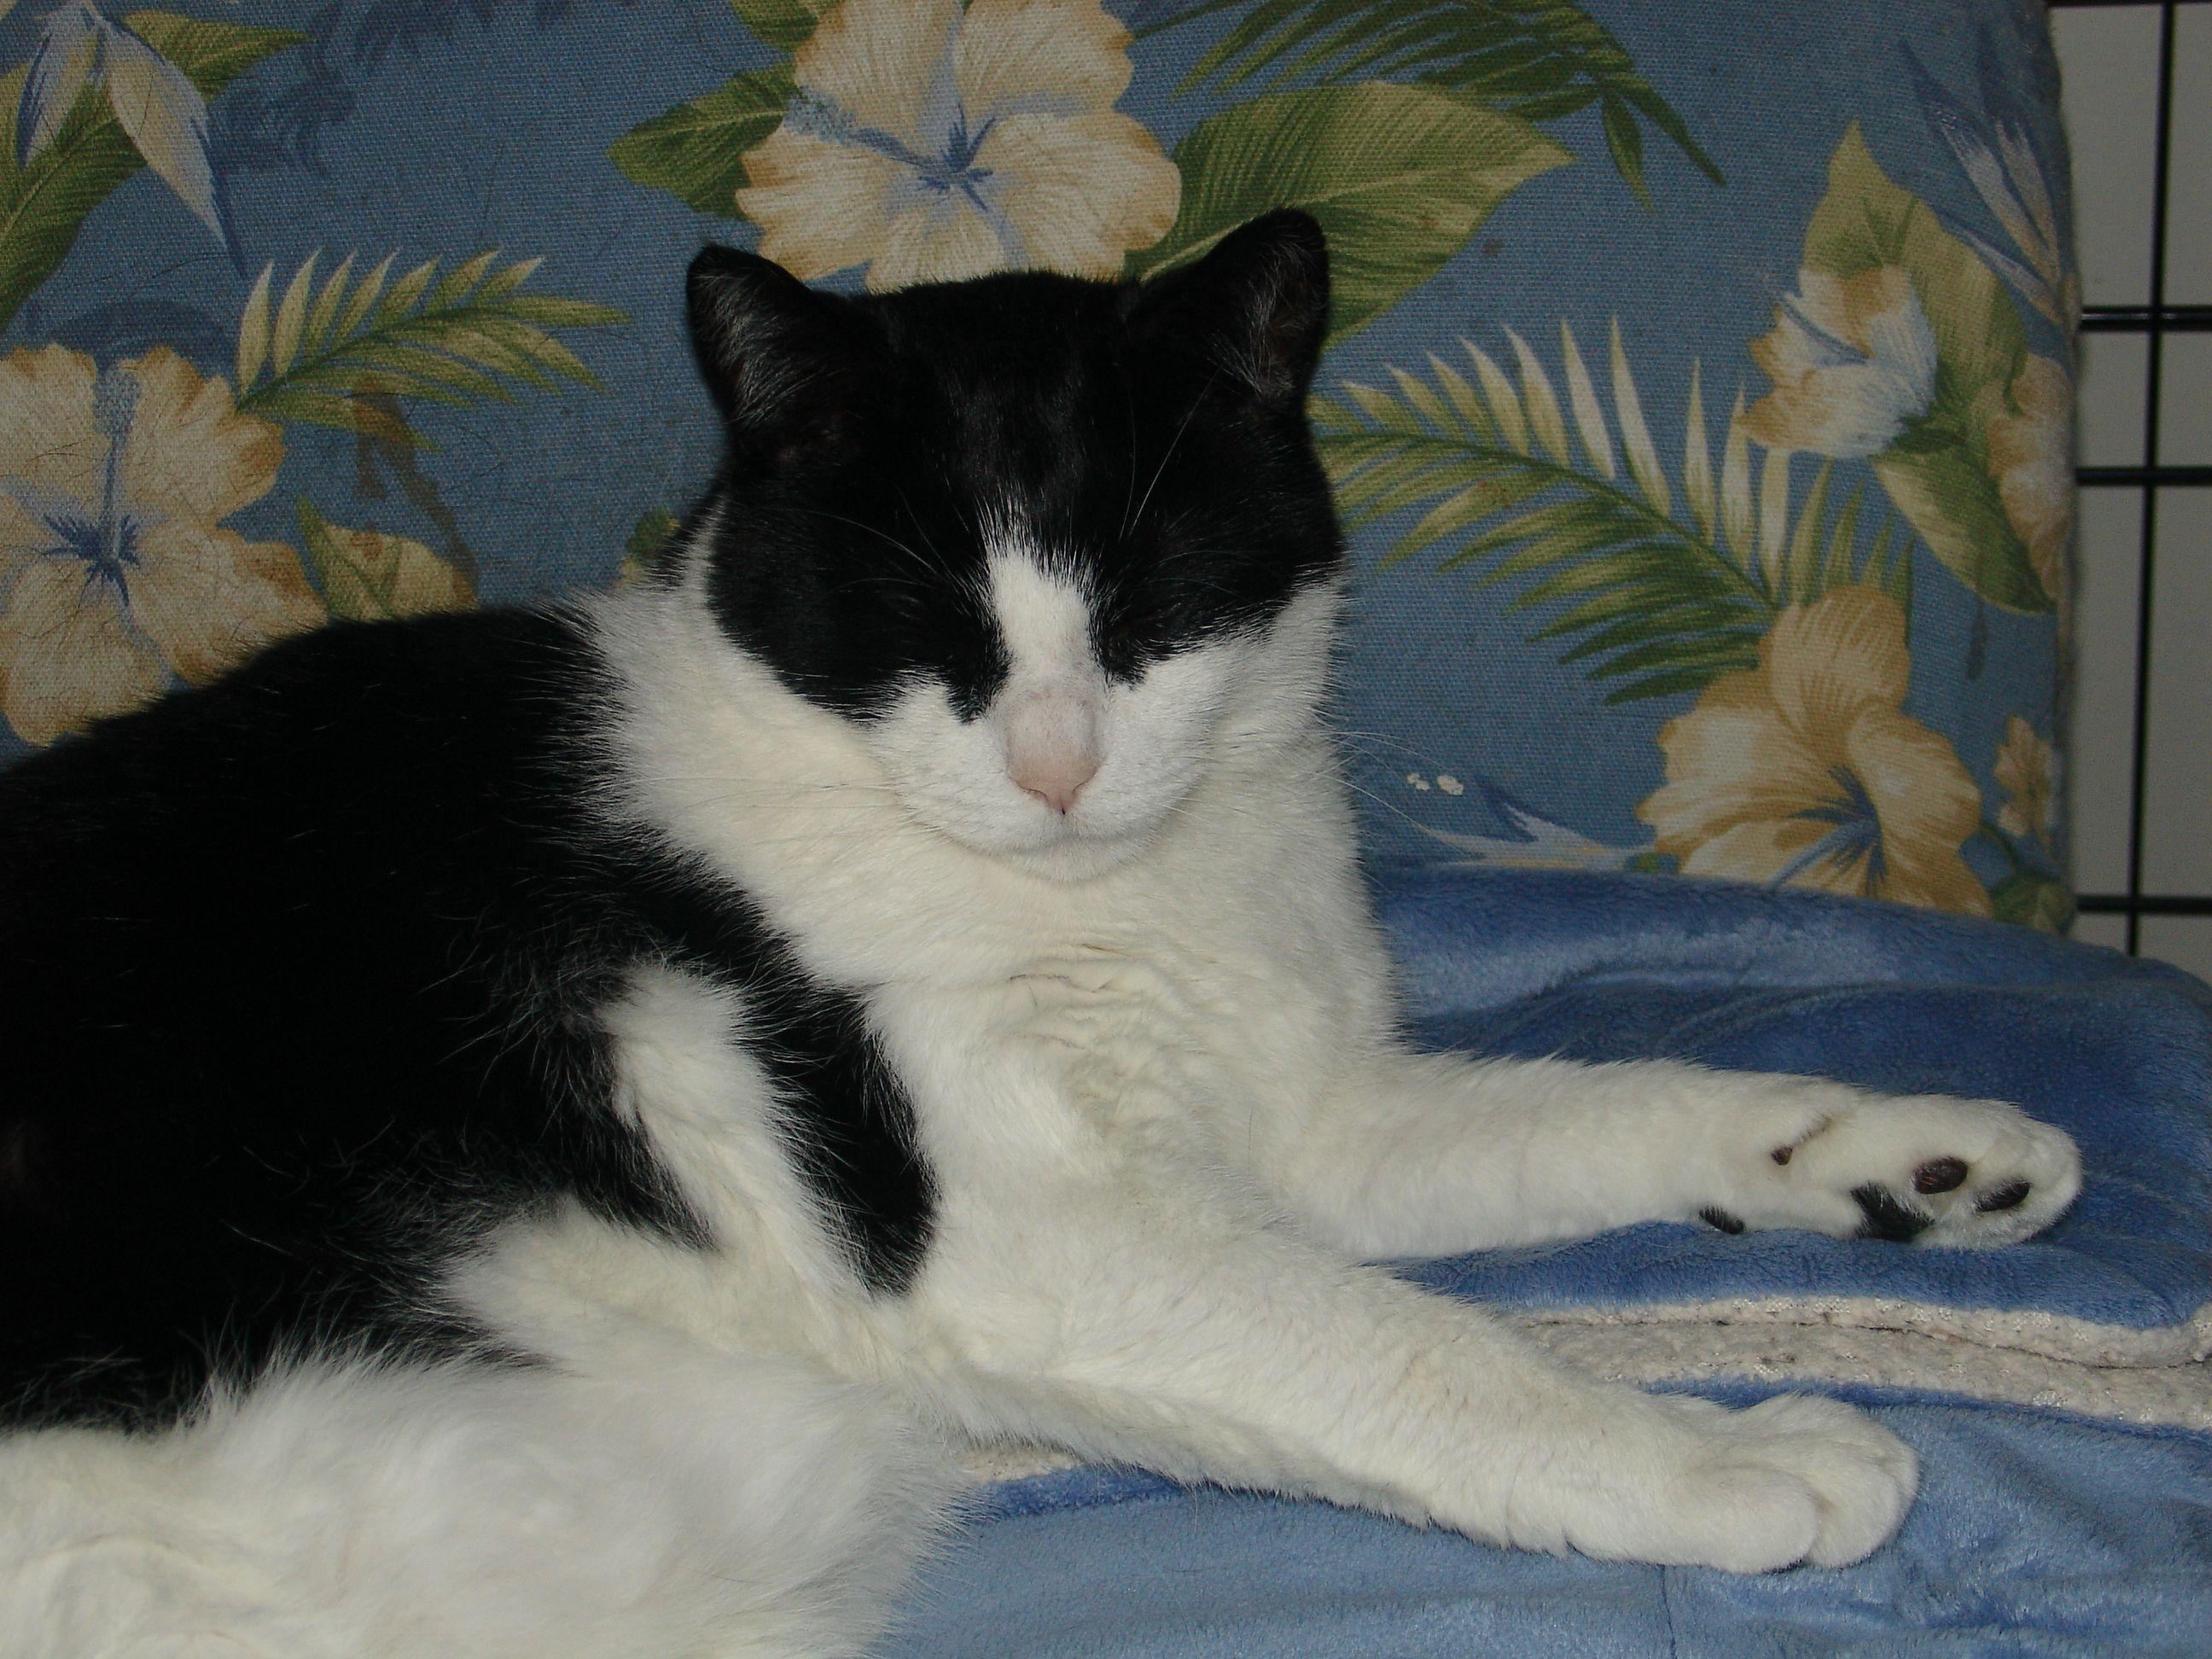 Treating My Cat S Chronic Diarrhea And Inflammatory Bowel Disease Cat Diarrhea Inflammatory Bowel Disease Cat Care